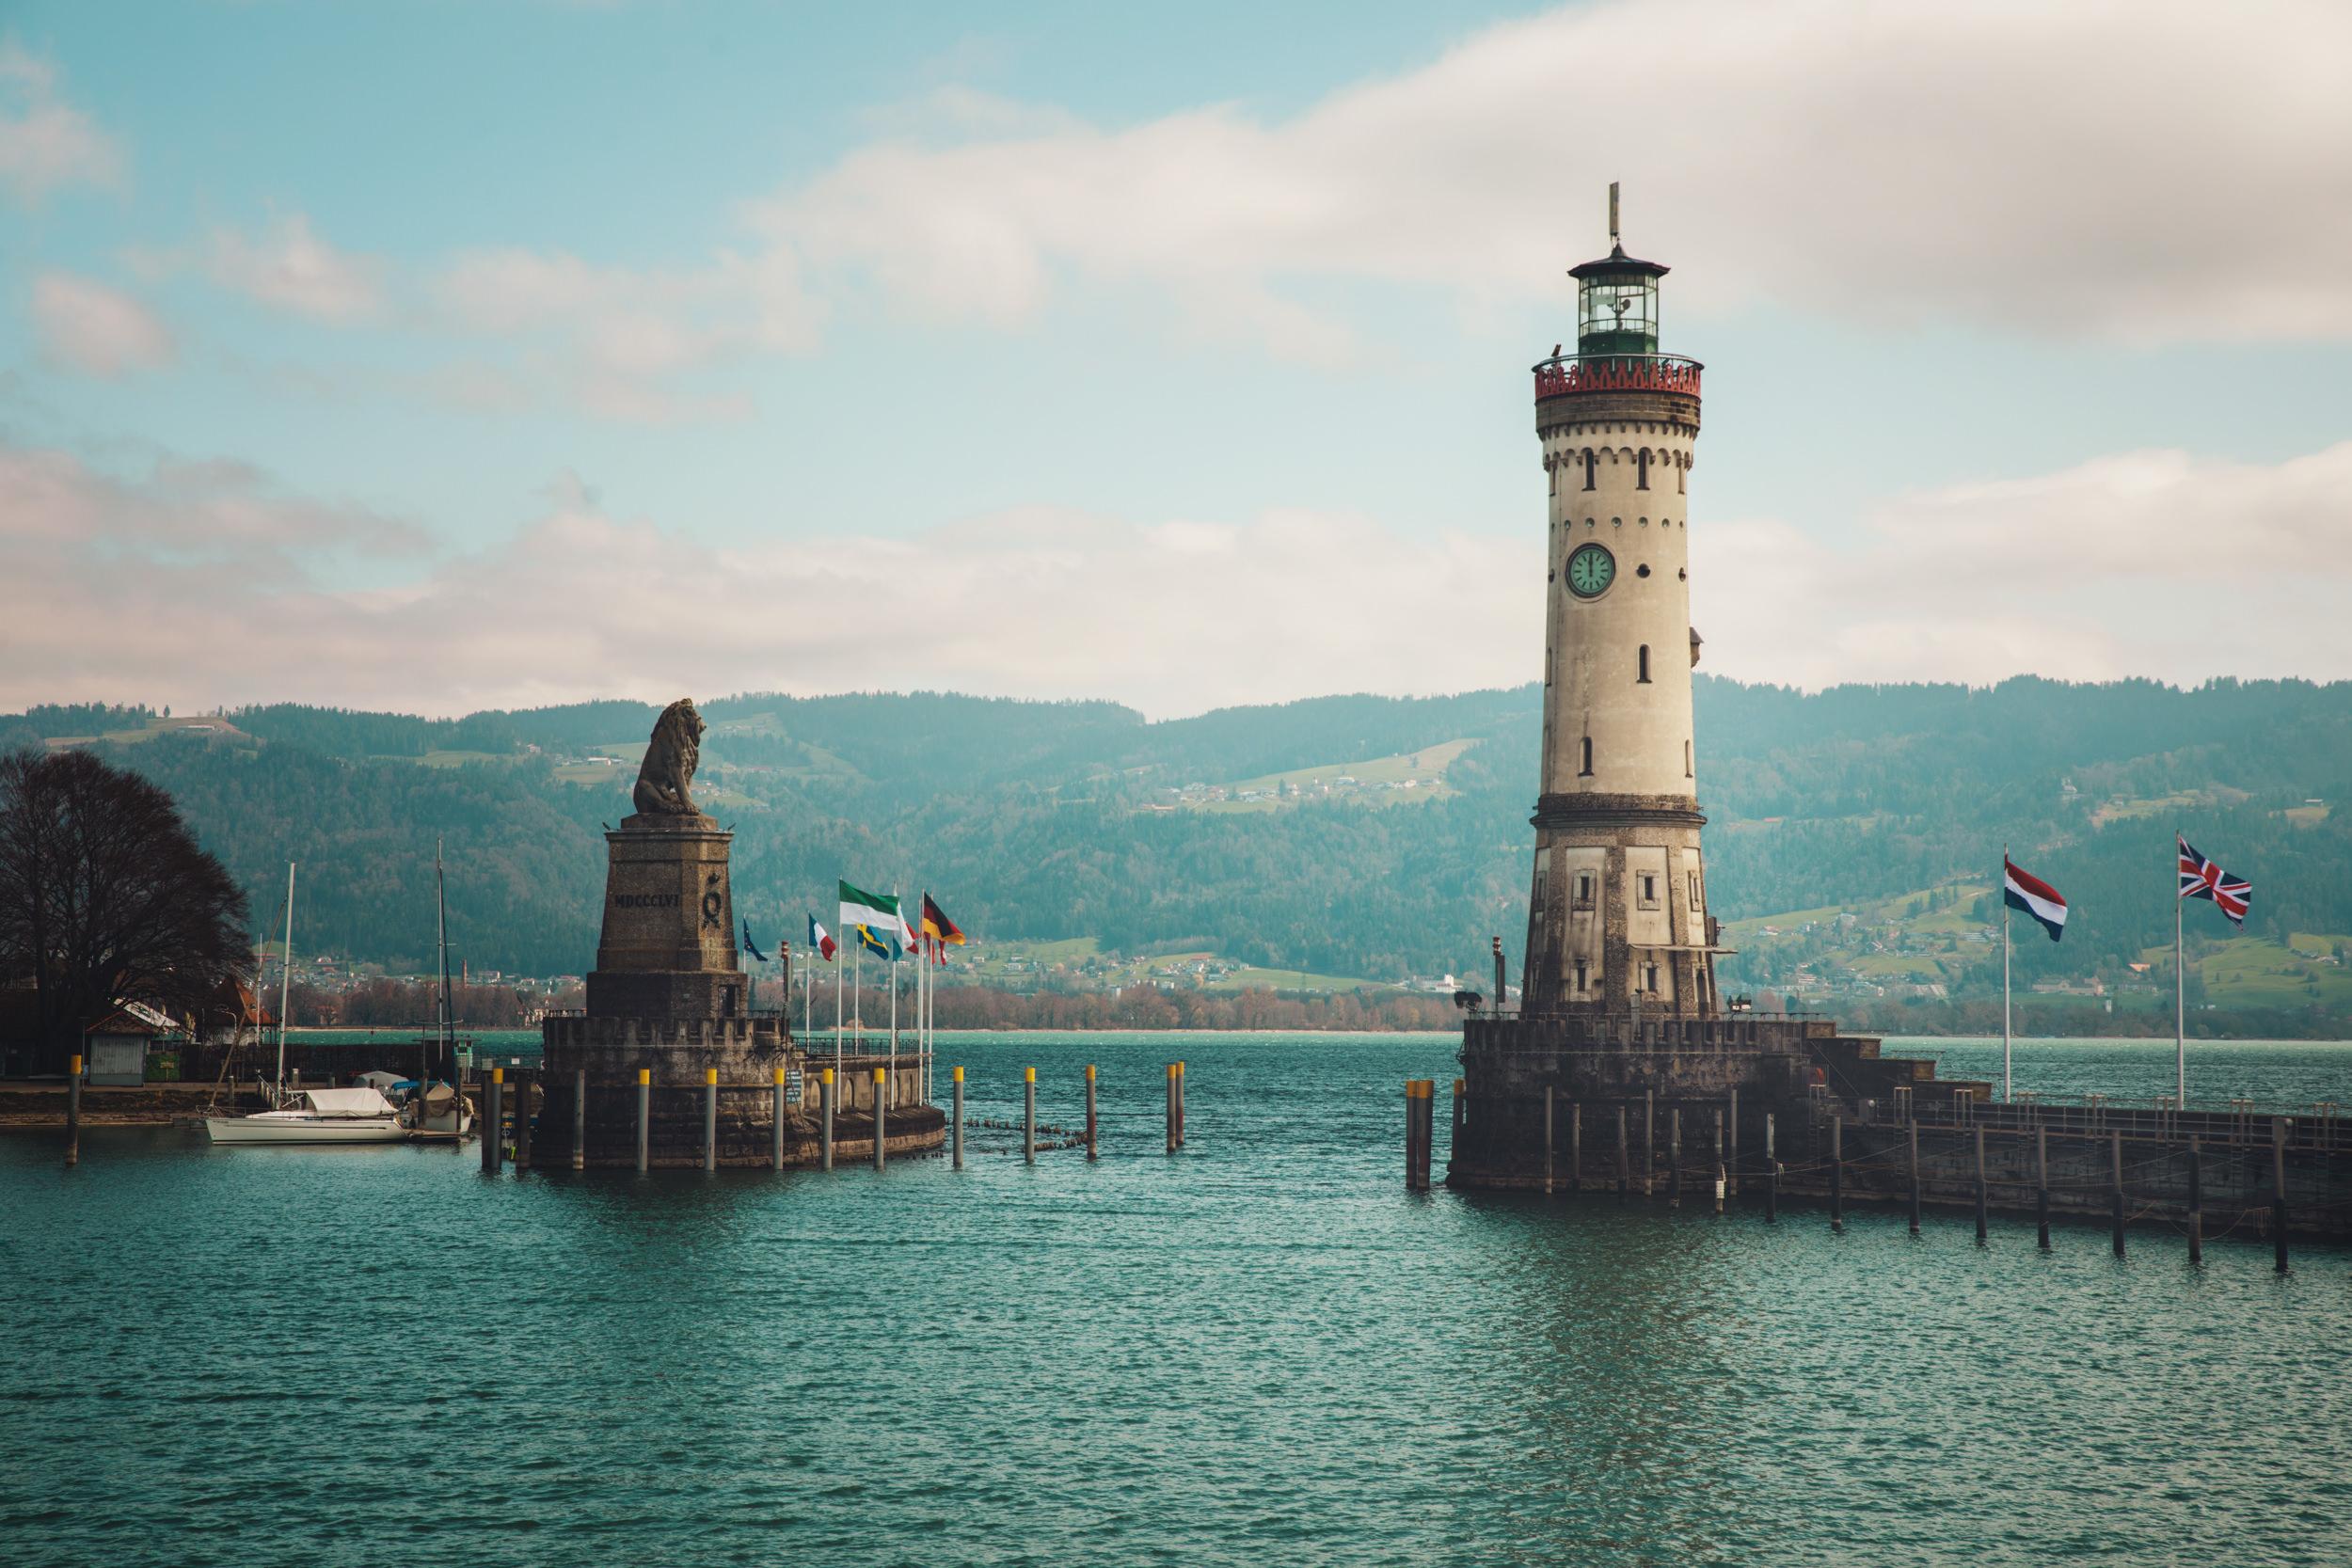 Landschaftsfotografie fotograf filmemacher frankfurt patrick schmetzer drohne landschaft natur 67